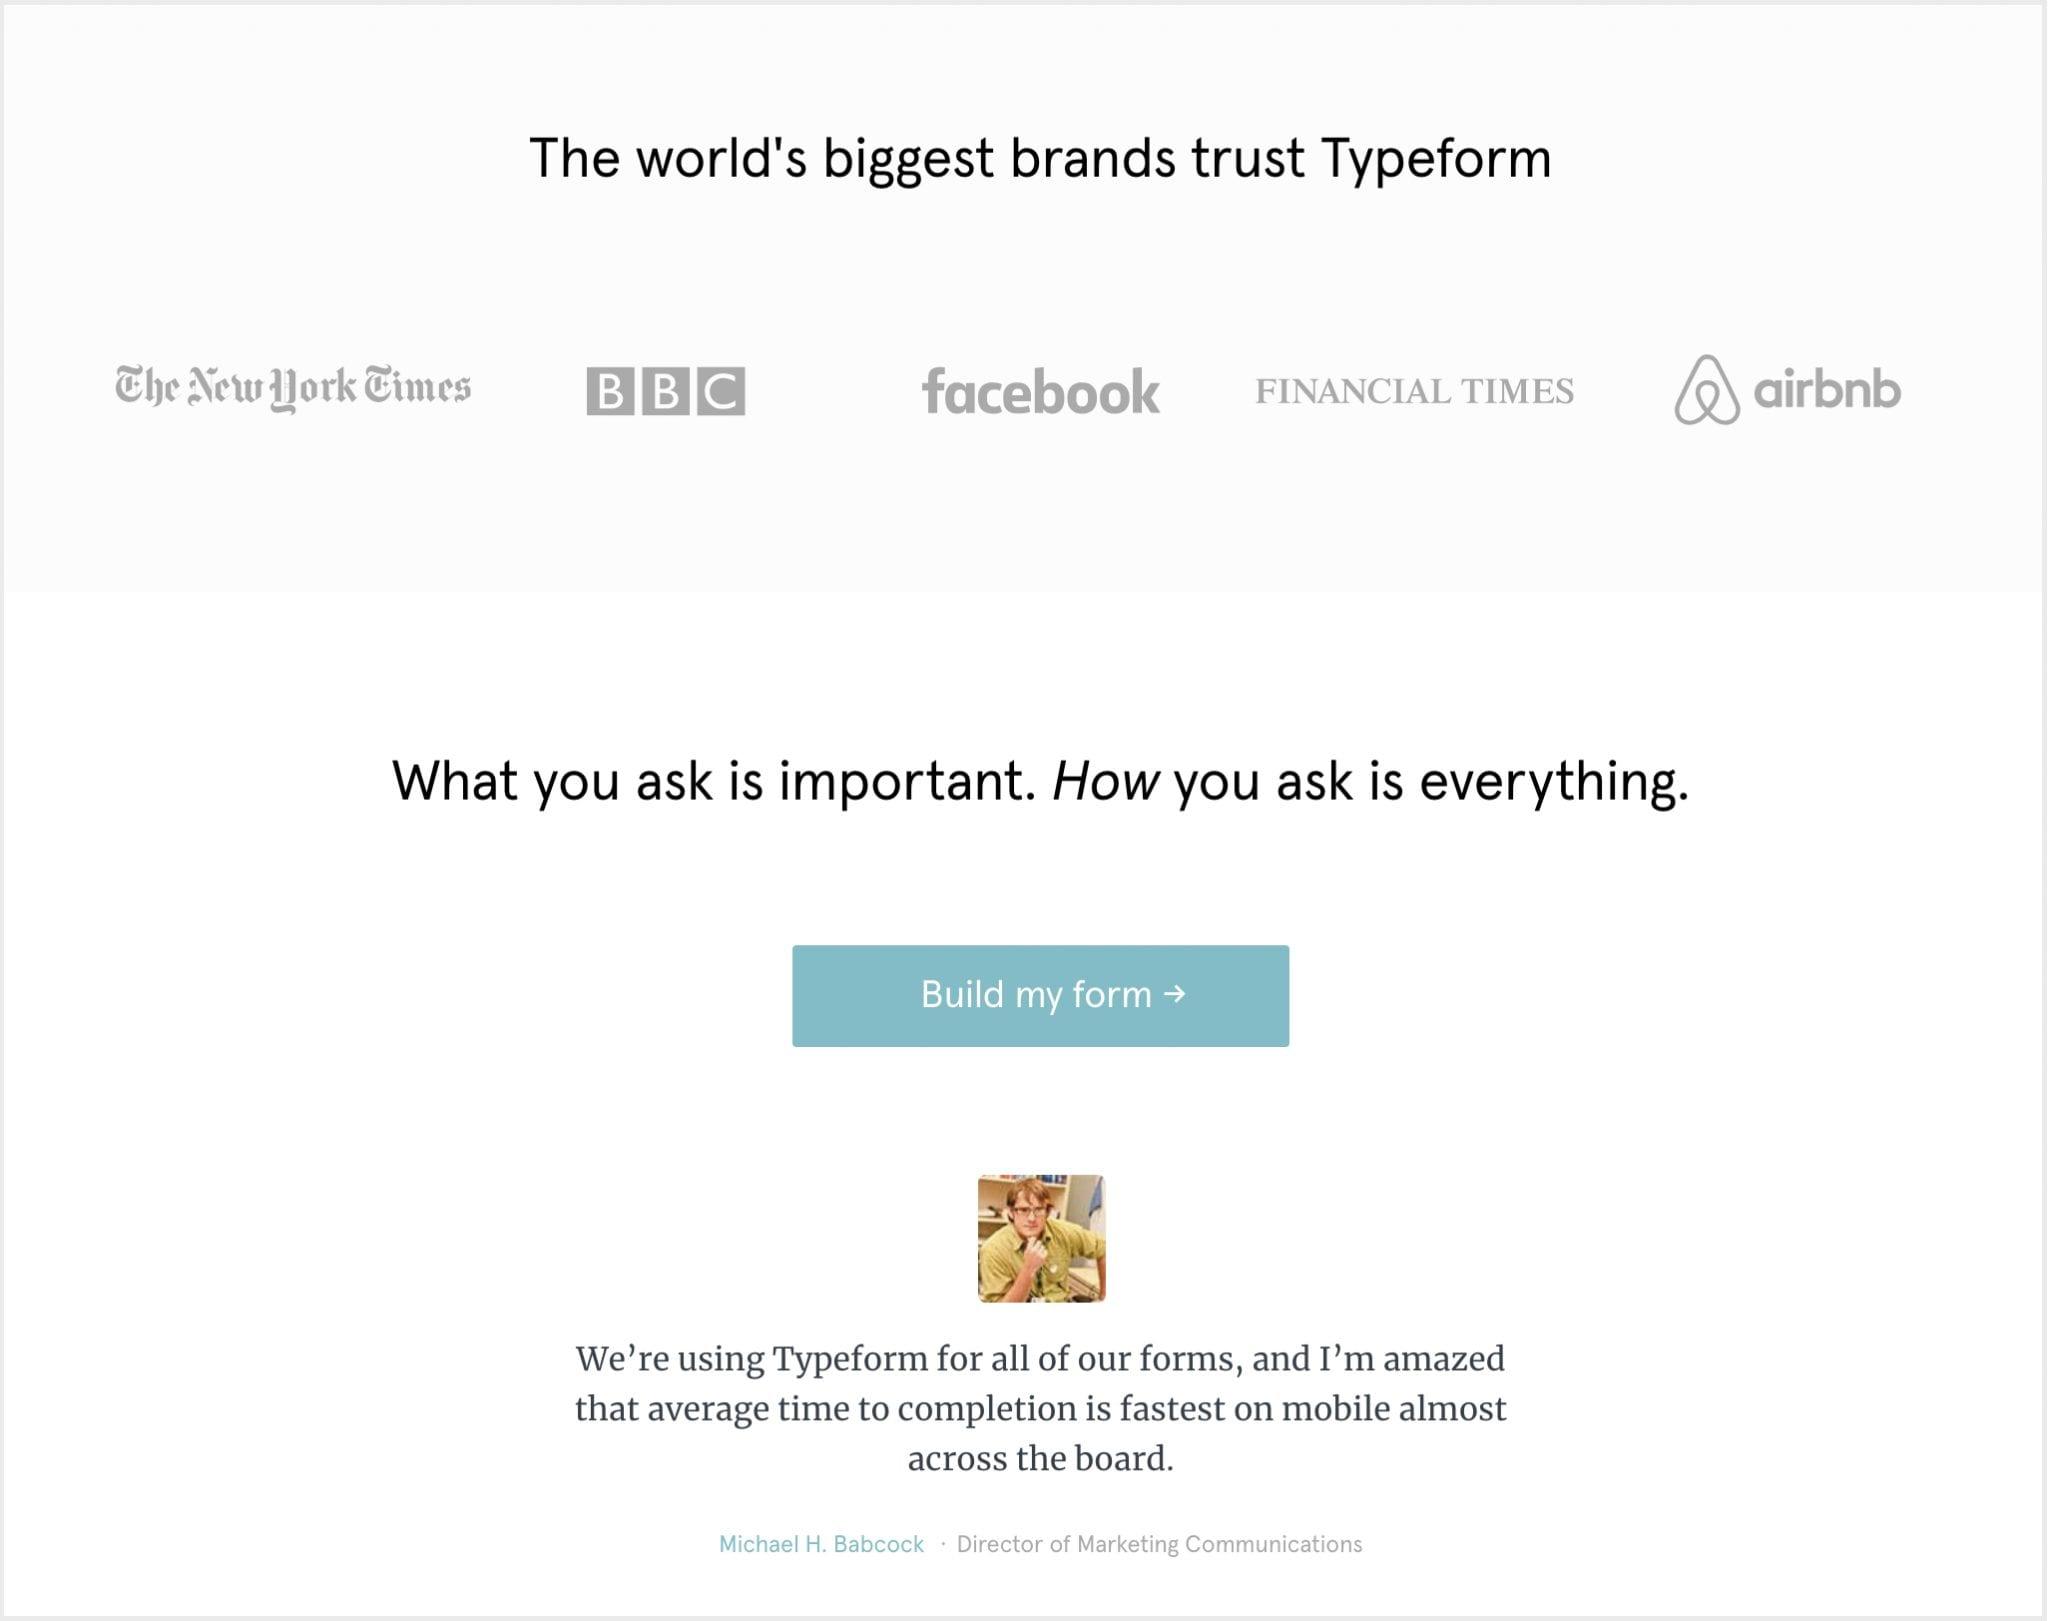 Typeform's landing page